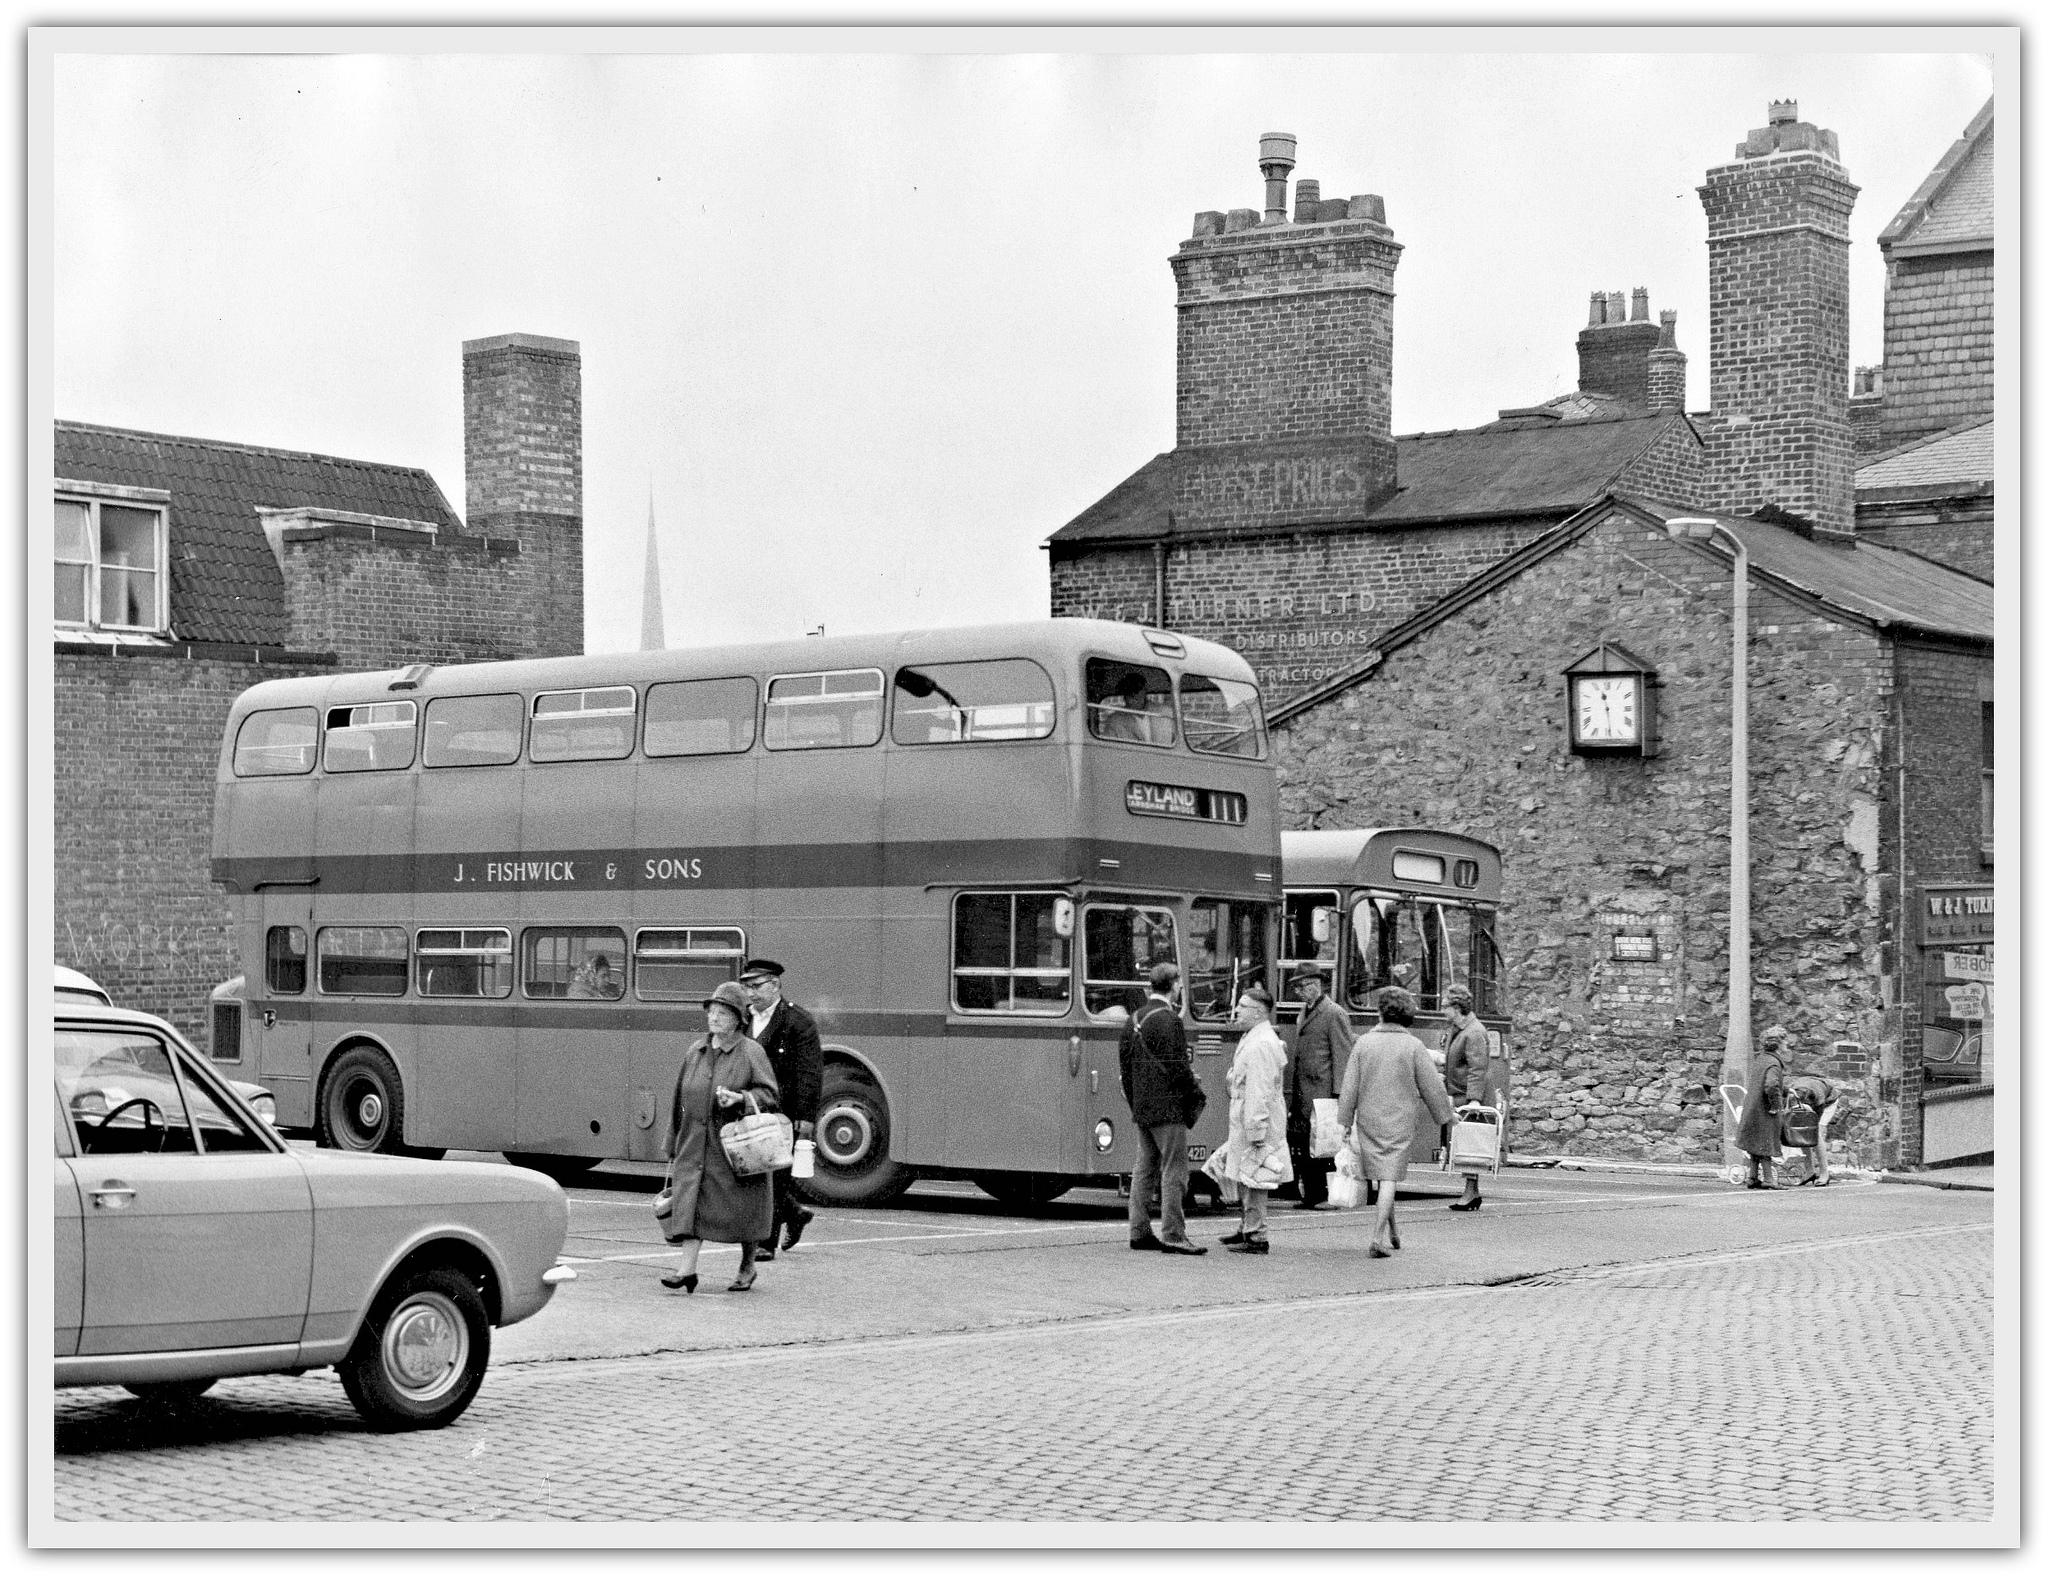 Fishwick Bus Station, Fox Street, Preston c.1968